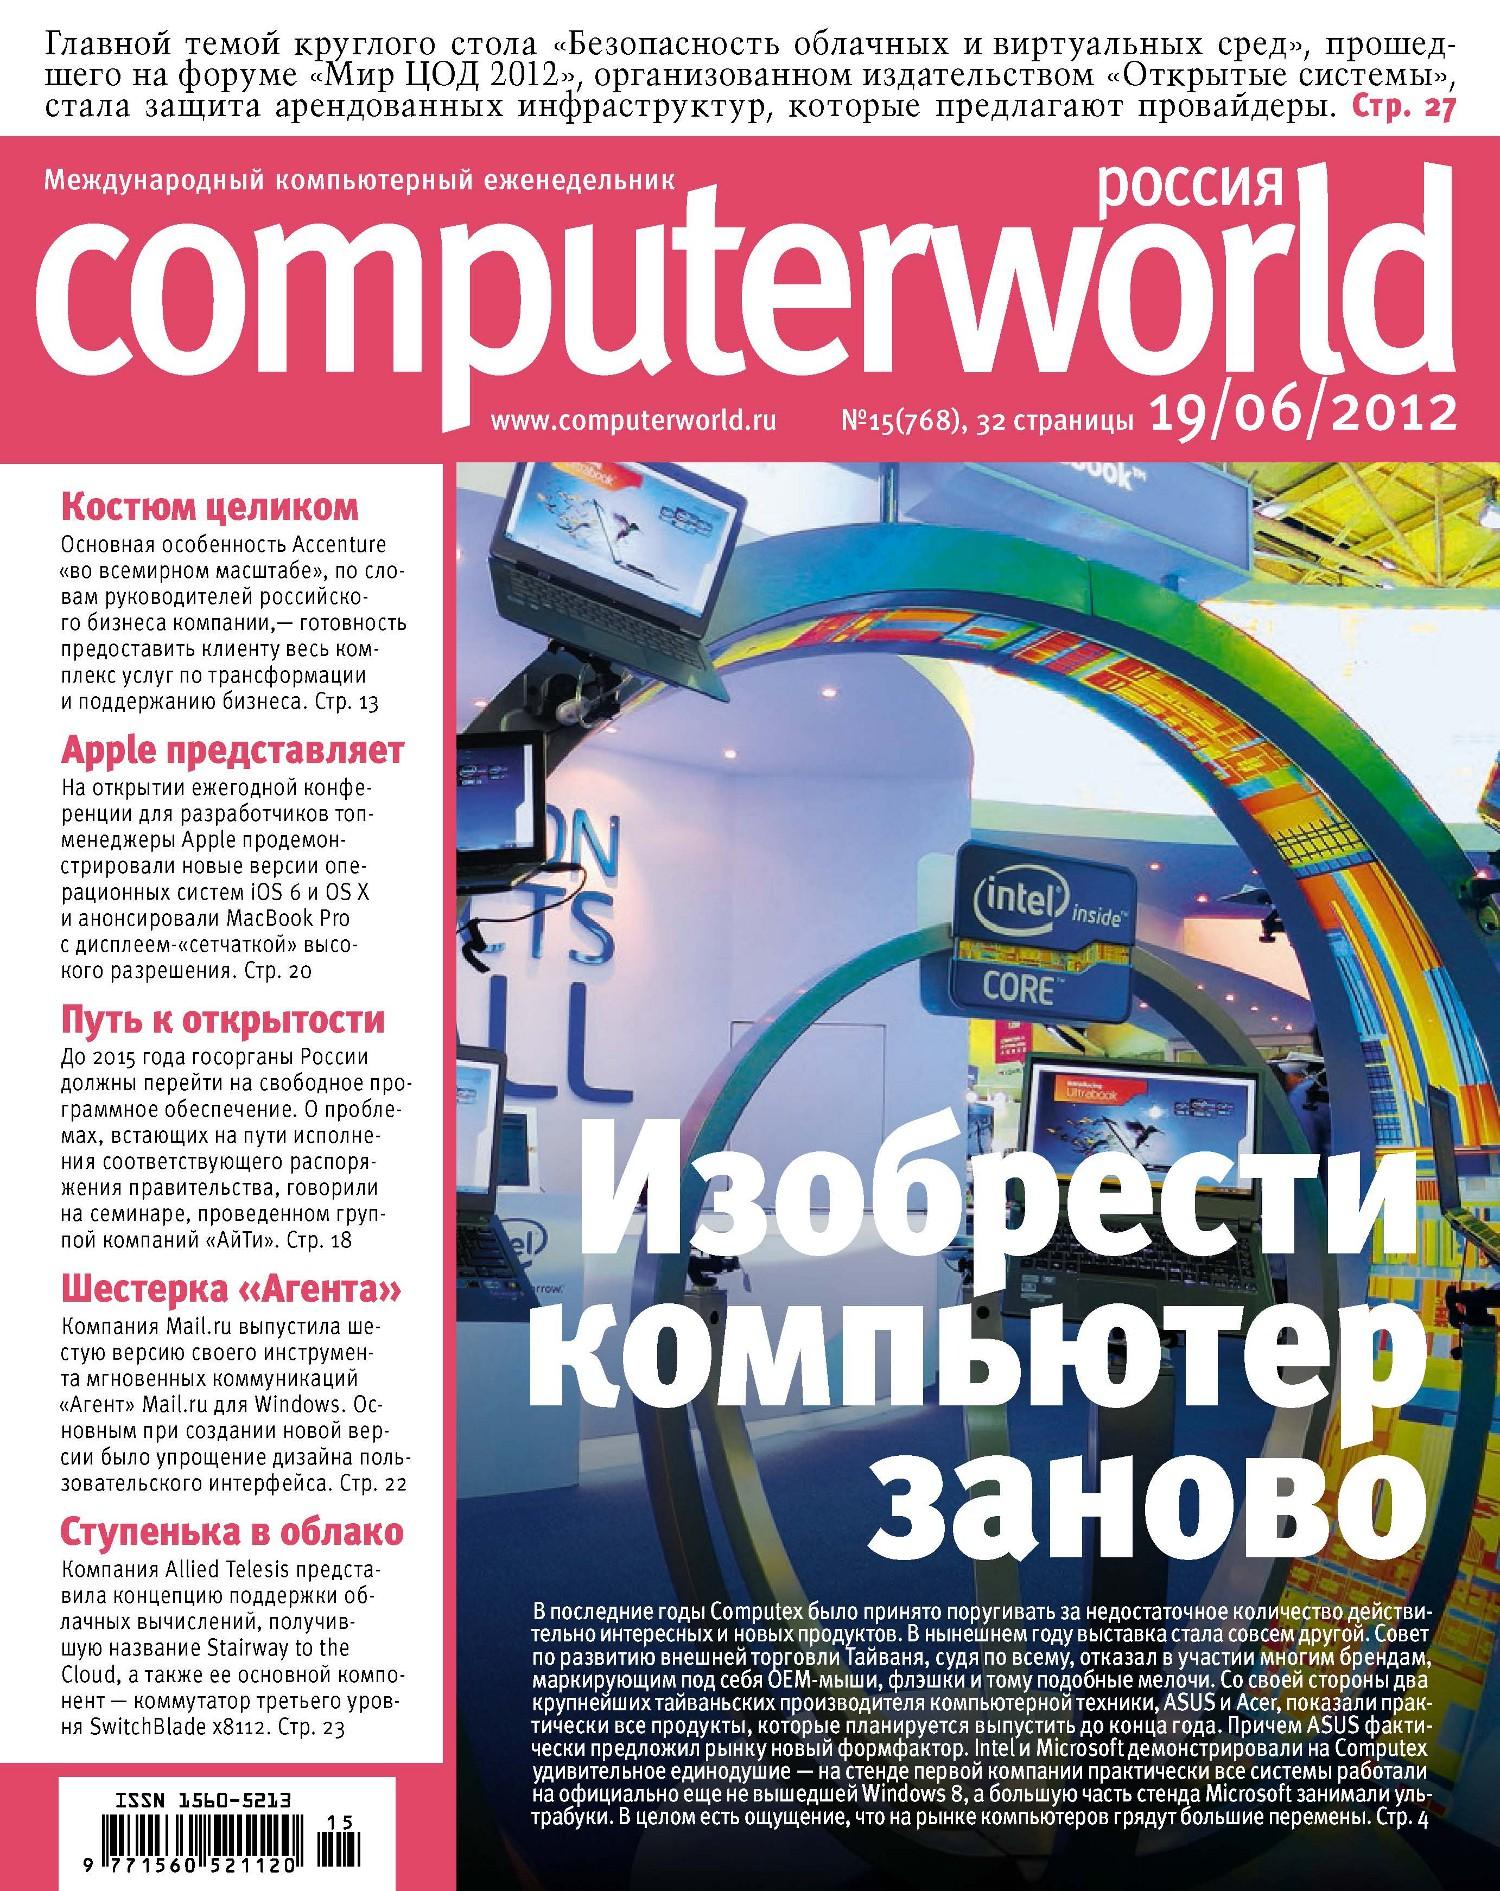 Журнал Computerworld Россия №15/2012